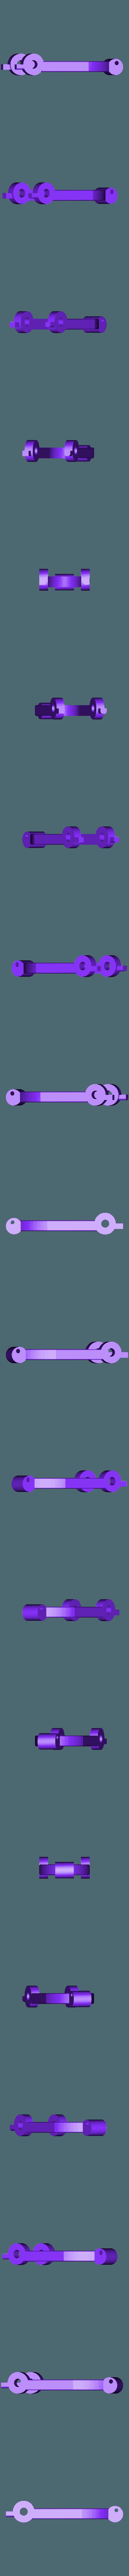 Swing_arm.STL Download STL file Cafe racer • Model to 3D print, Guillaume_975